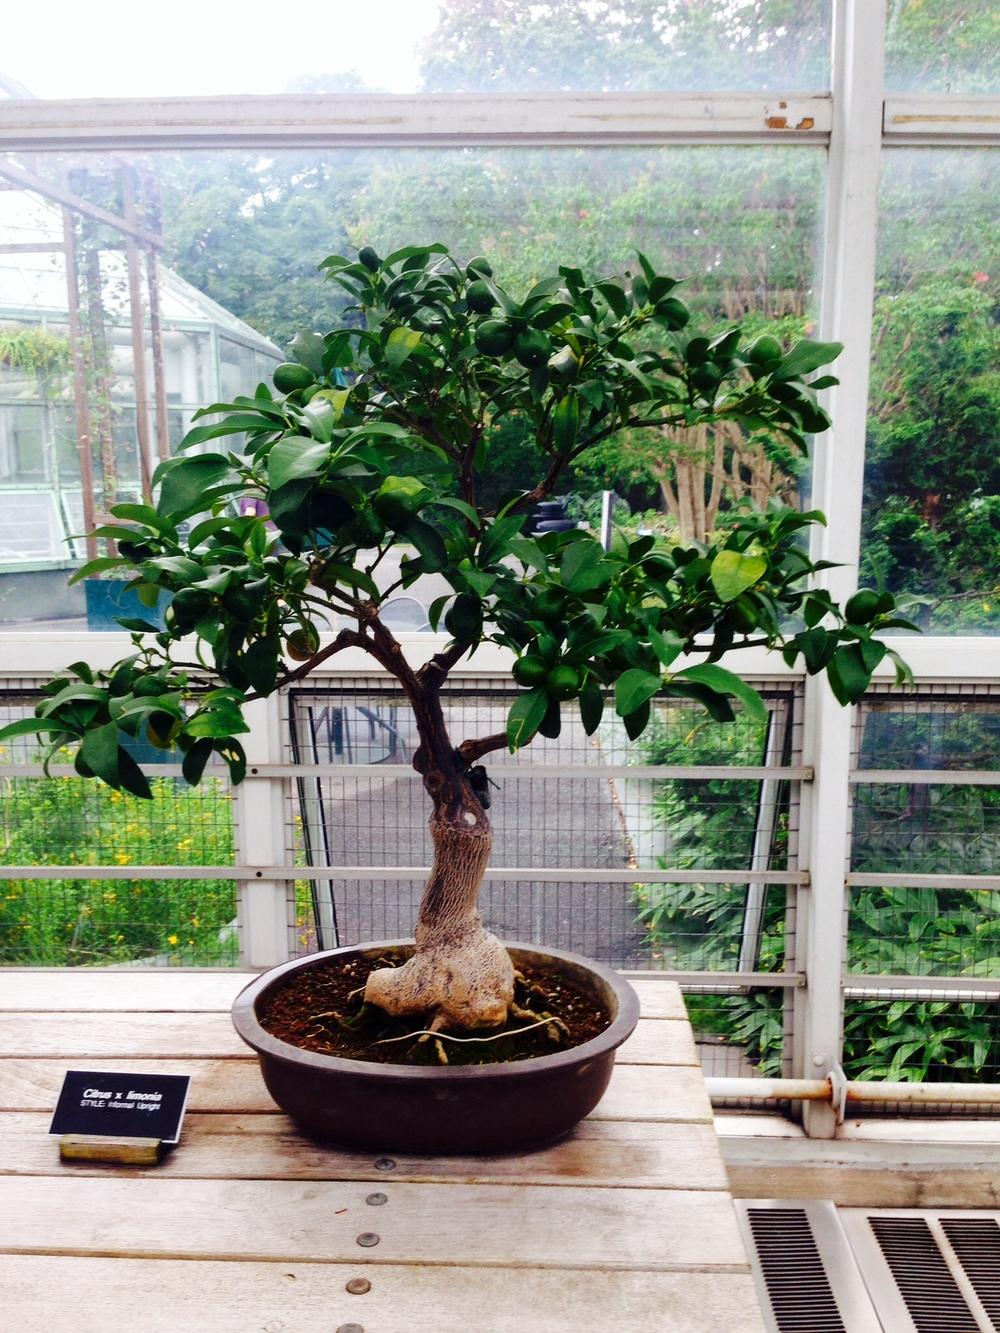 Lime Bonsai at the Botanic Gardens-Brooklyn New York